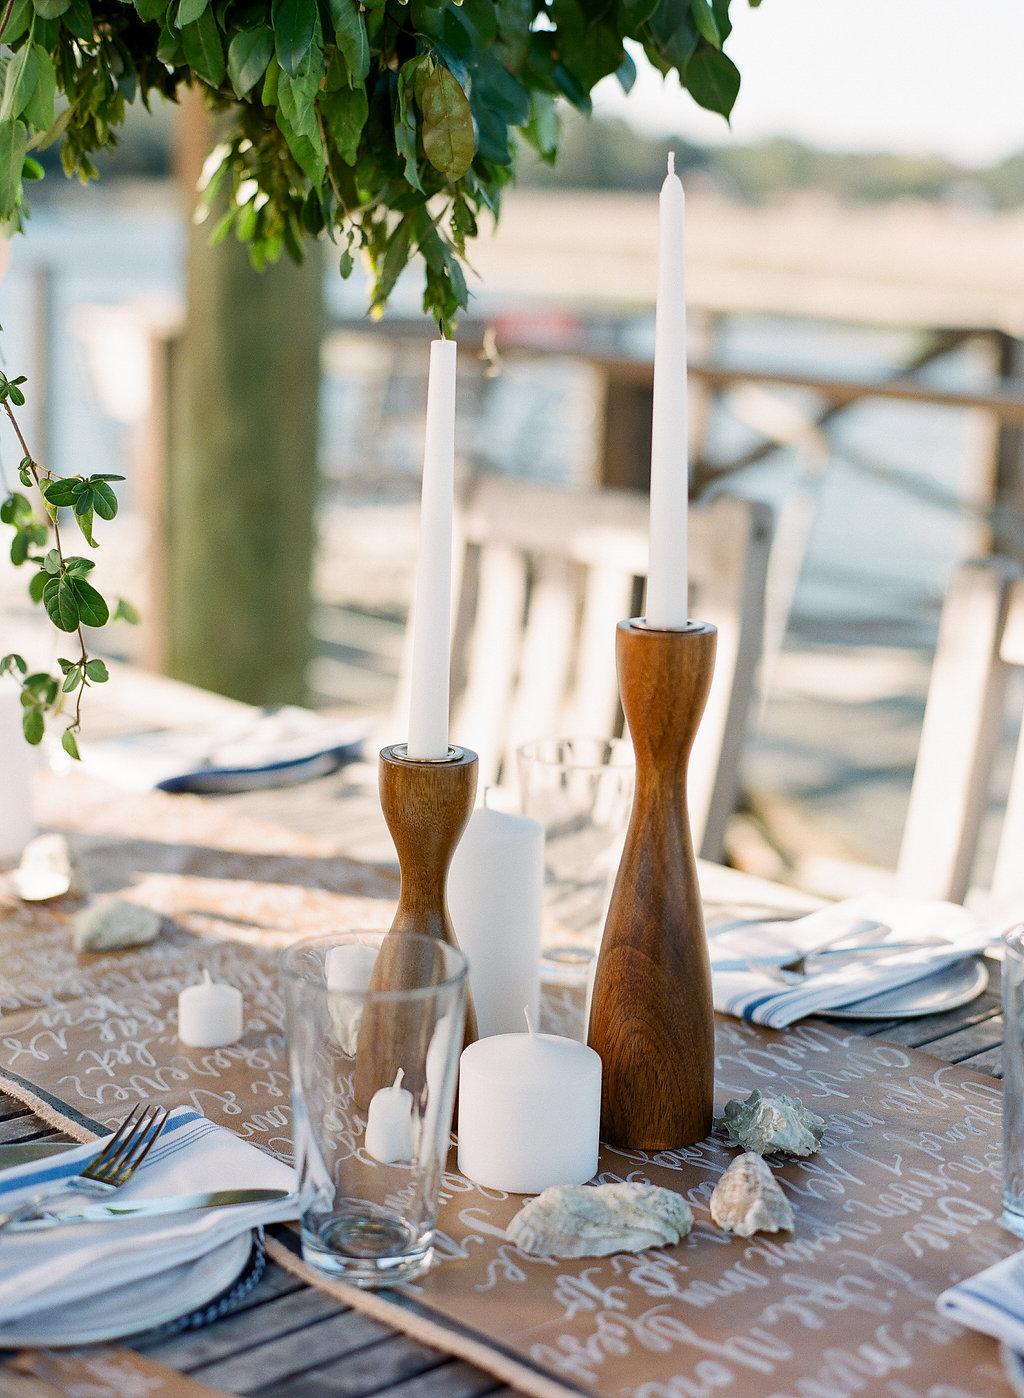 target-candles-centerpiece-wedding-inspiration-wedding-planner-savananh-event-designer-savannah-weddings-savannah-wedding-florist-ivory-and-beau-rustic-outdoor-wedding-the-wyld.jpg